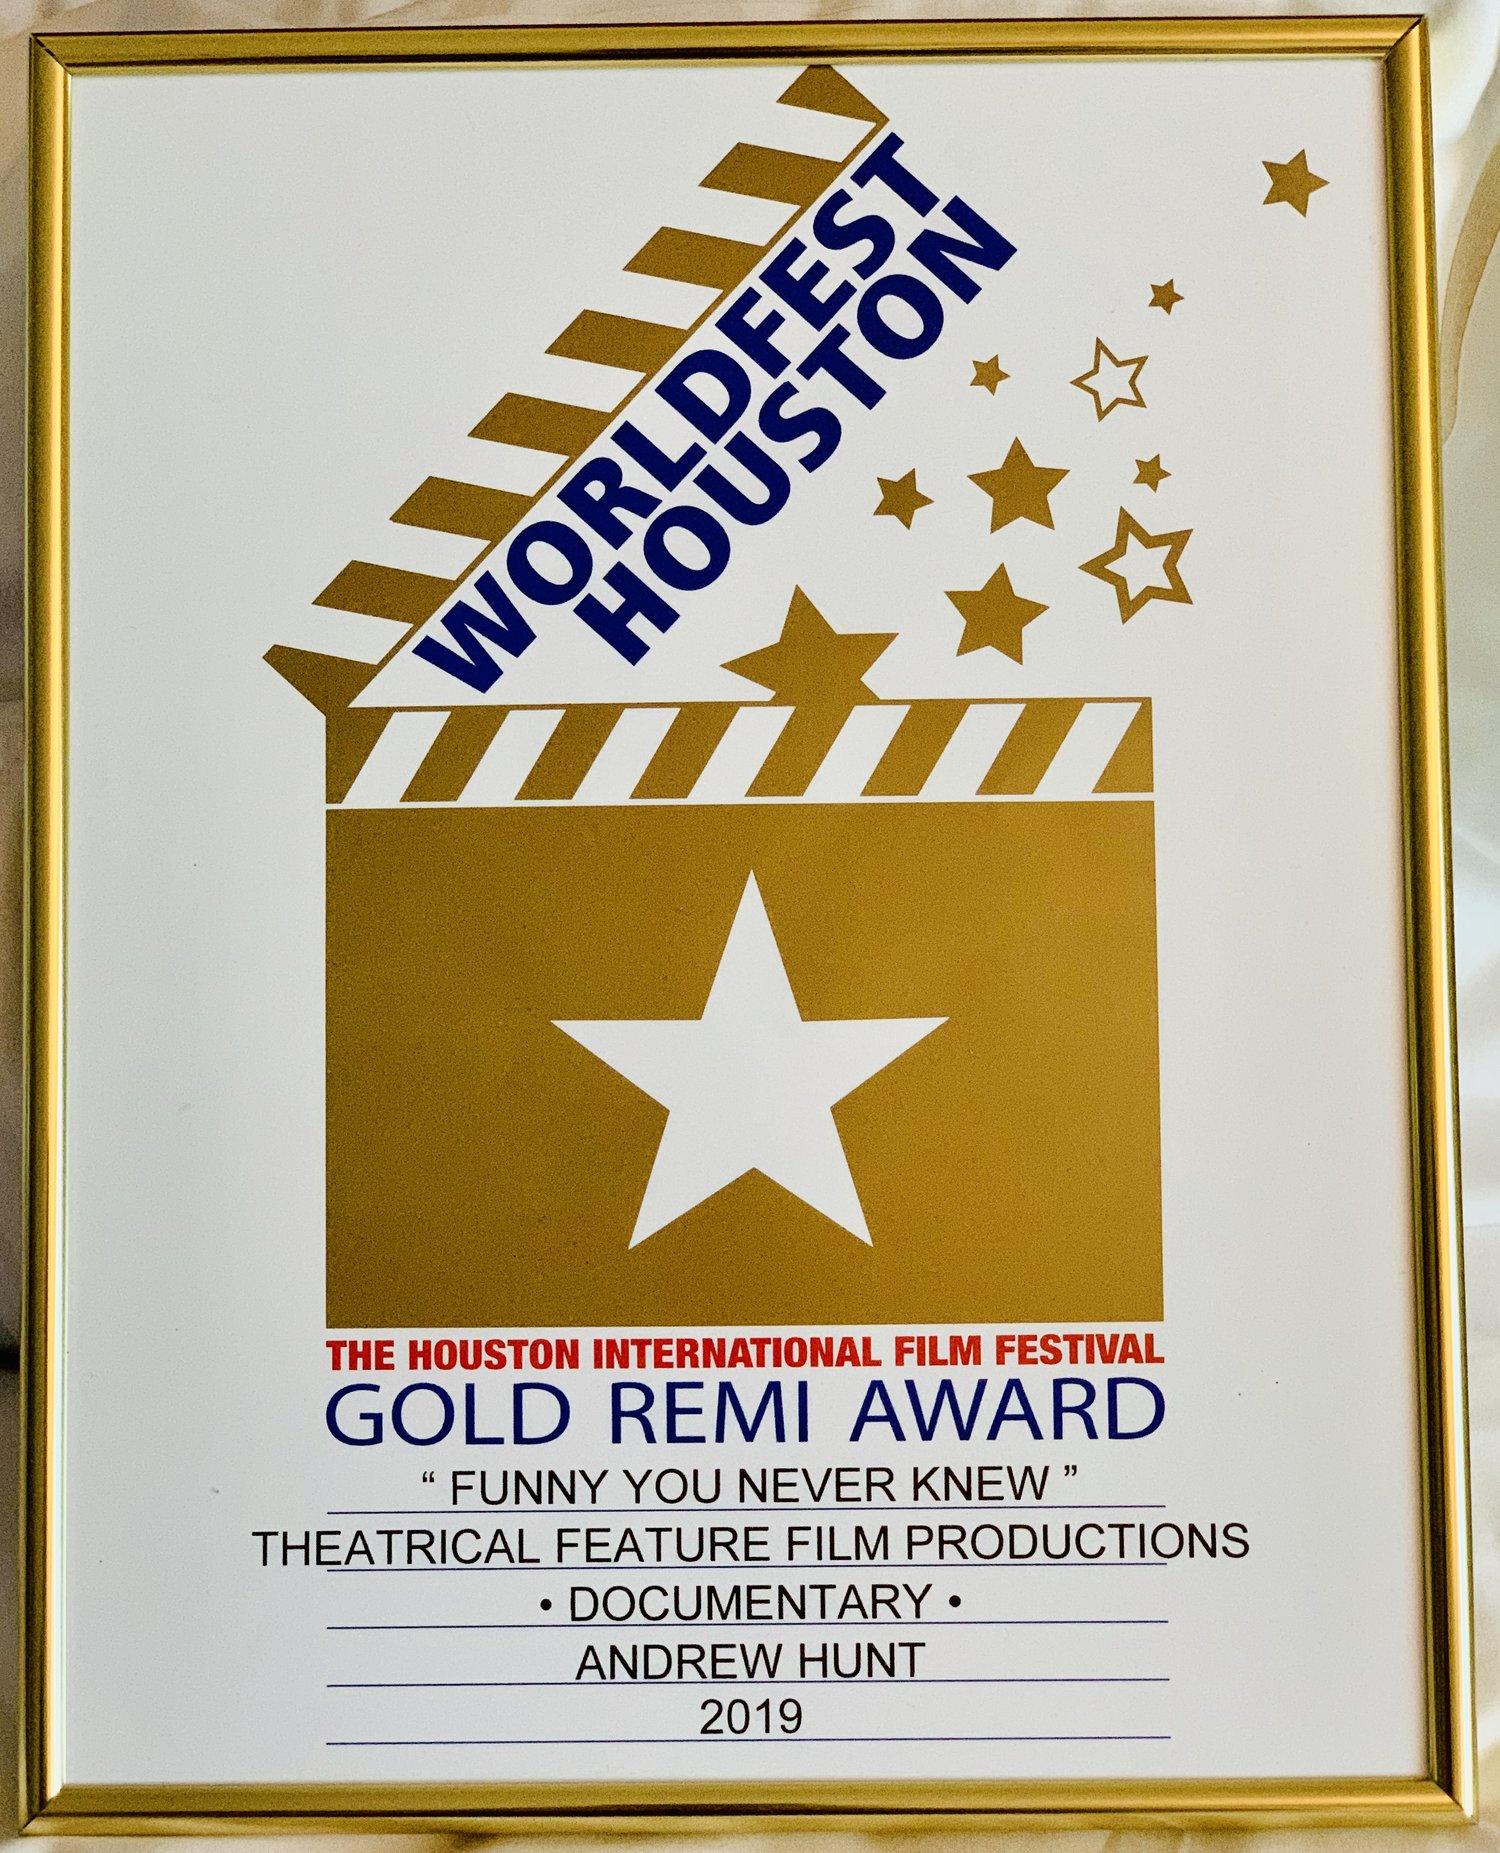 FYNK_Gold_Remi_Award.jpg